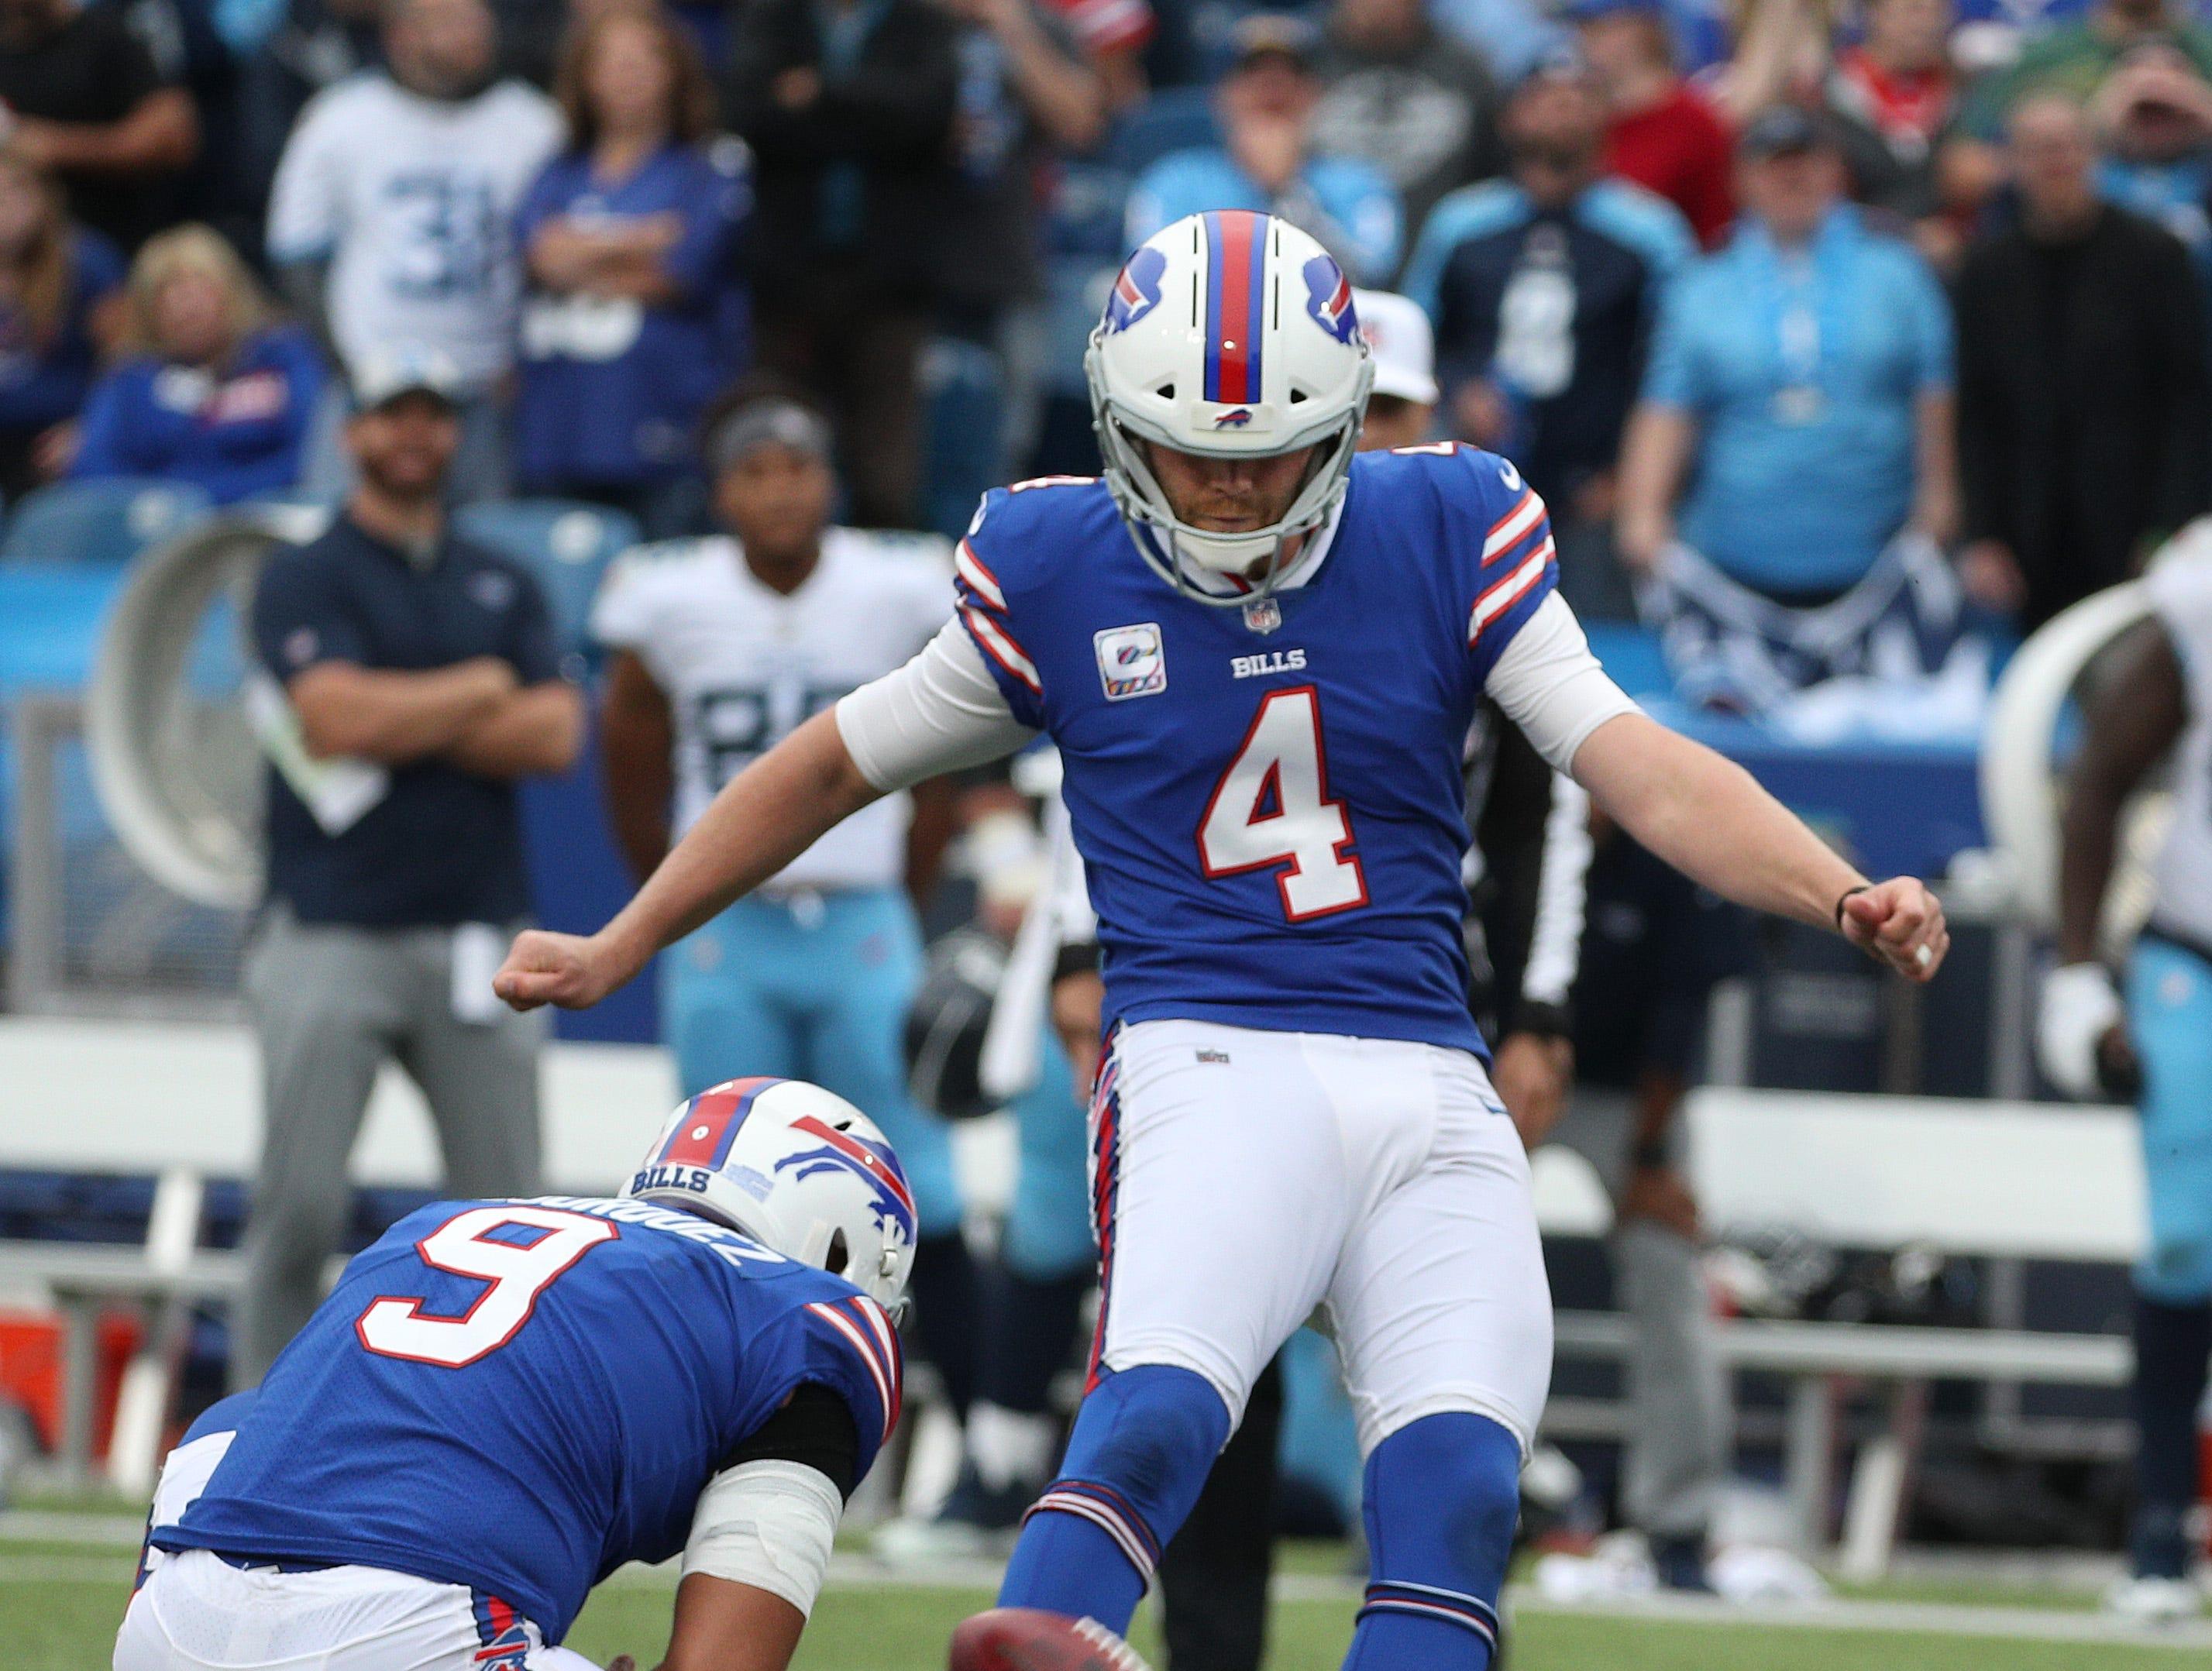 Bills kicker Stephen Hauschka kicks a 46-yard field goal to beat the Titan 13-12 on the last play of the game.